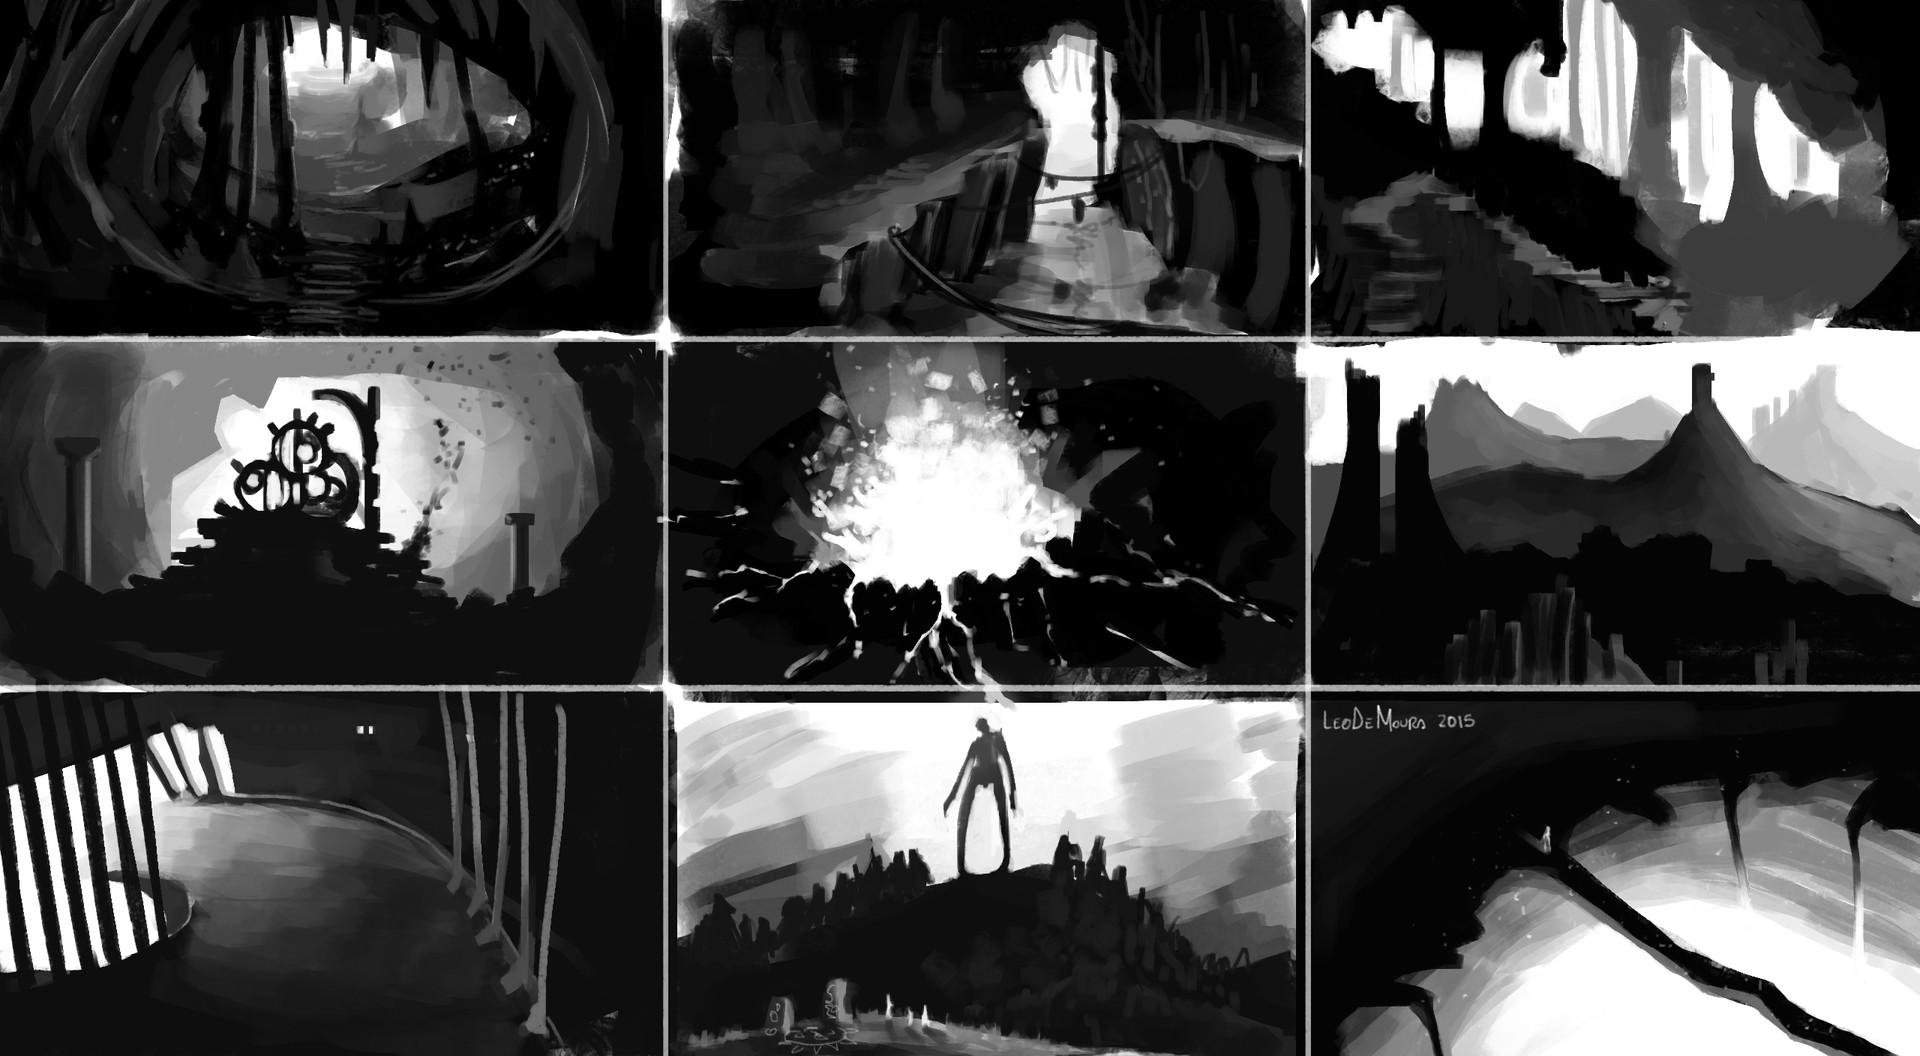 Leonardo de moura thumbnails01